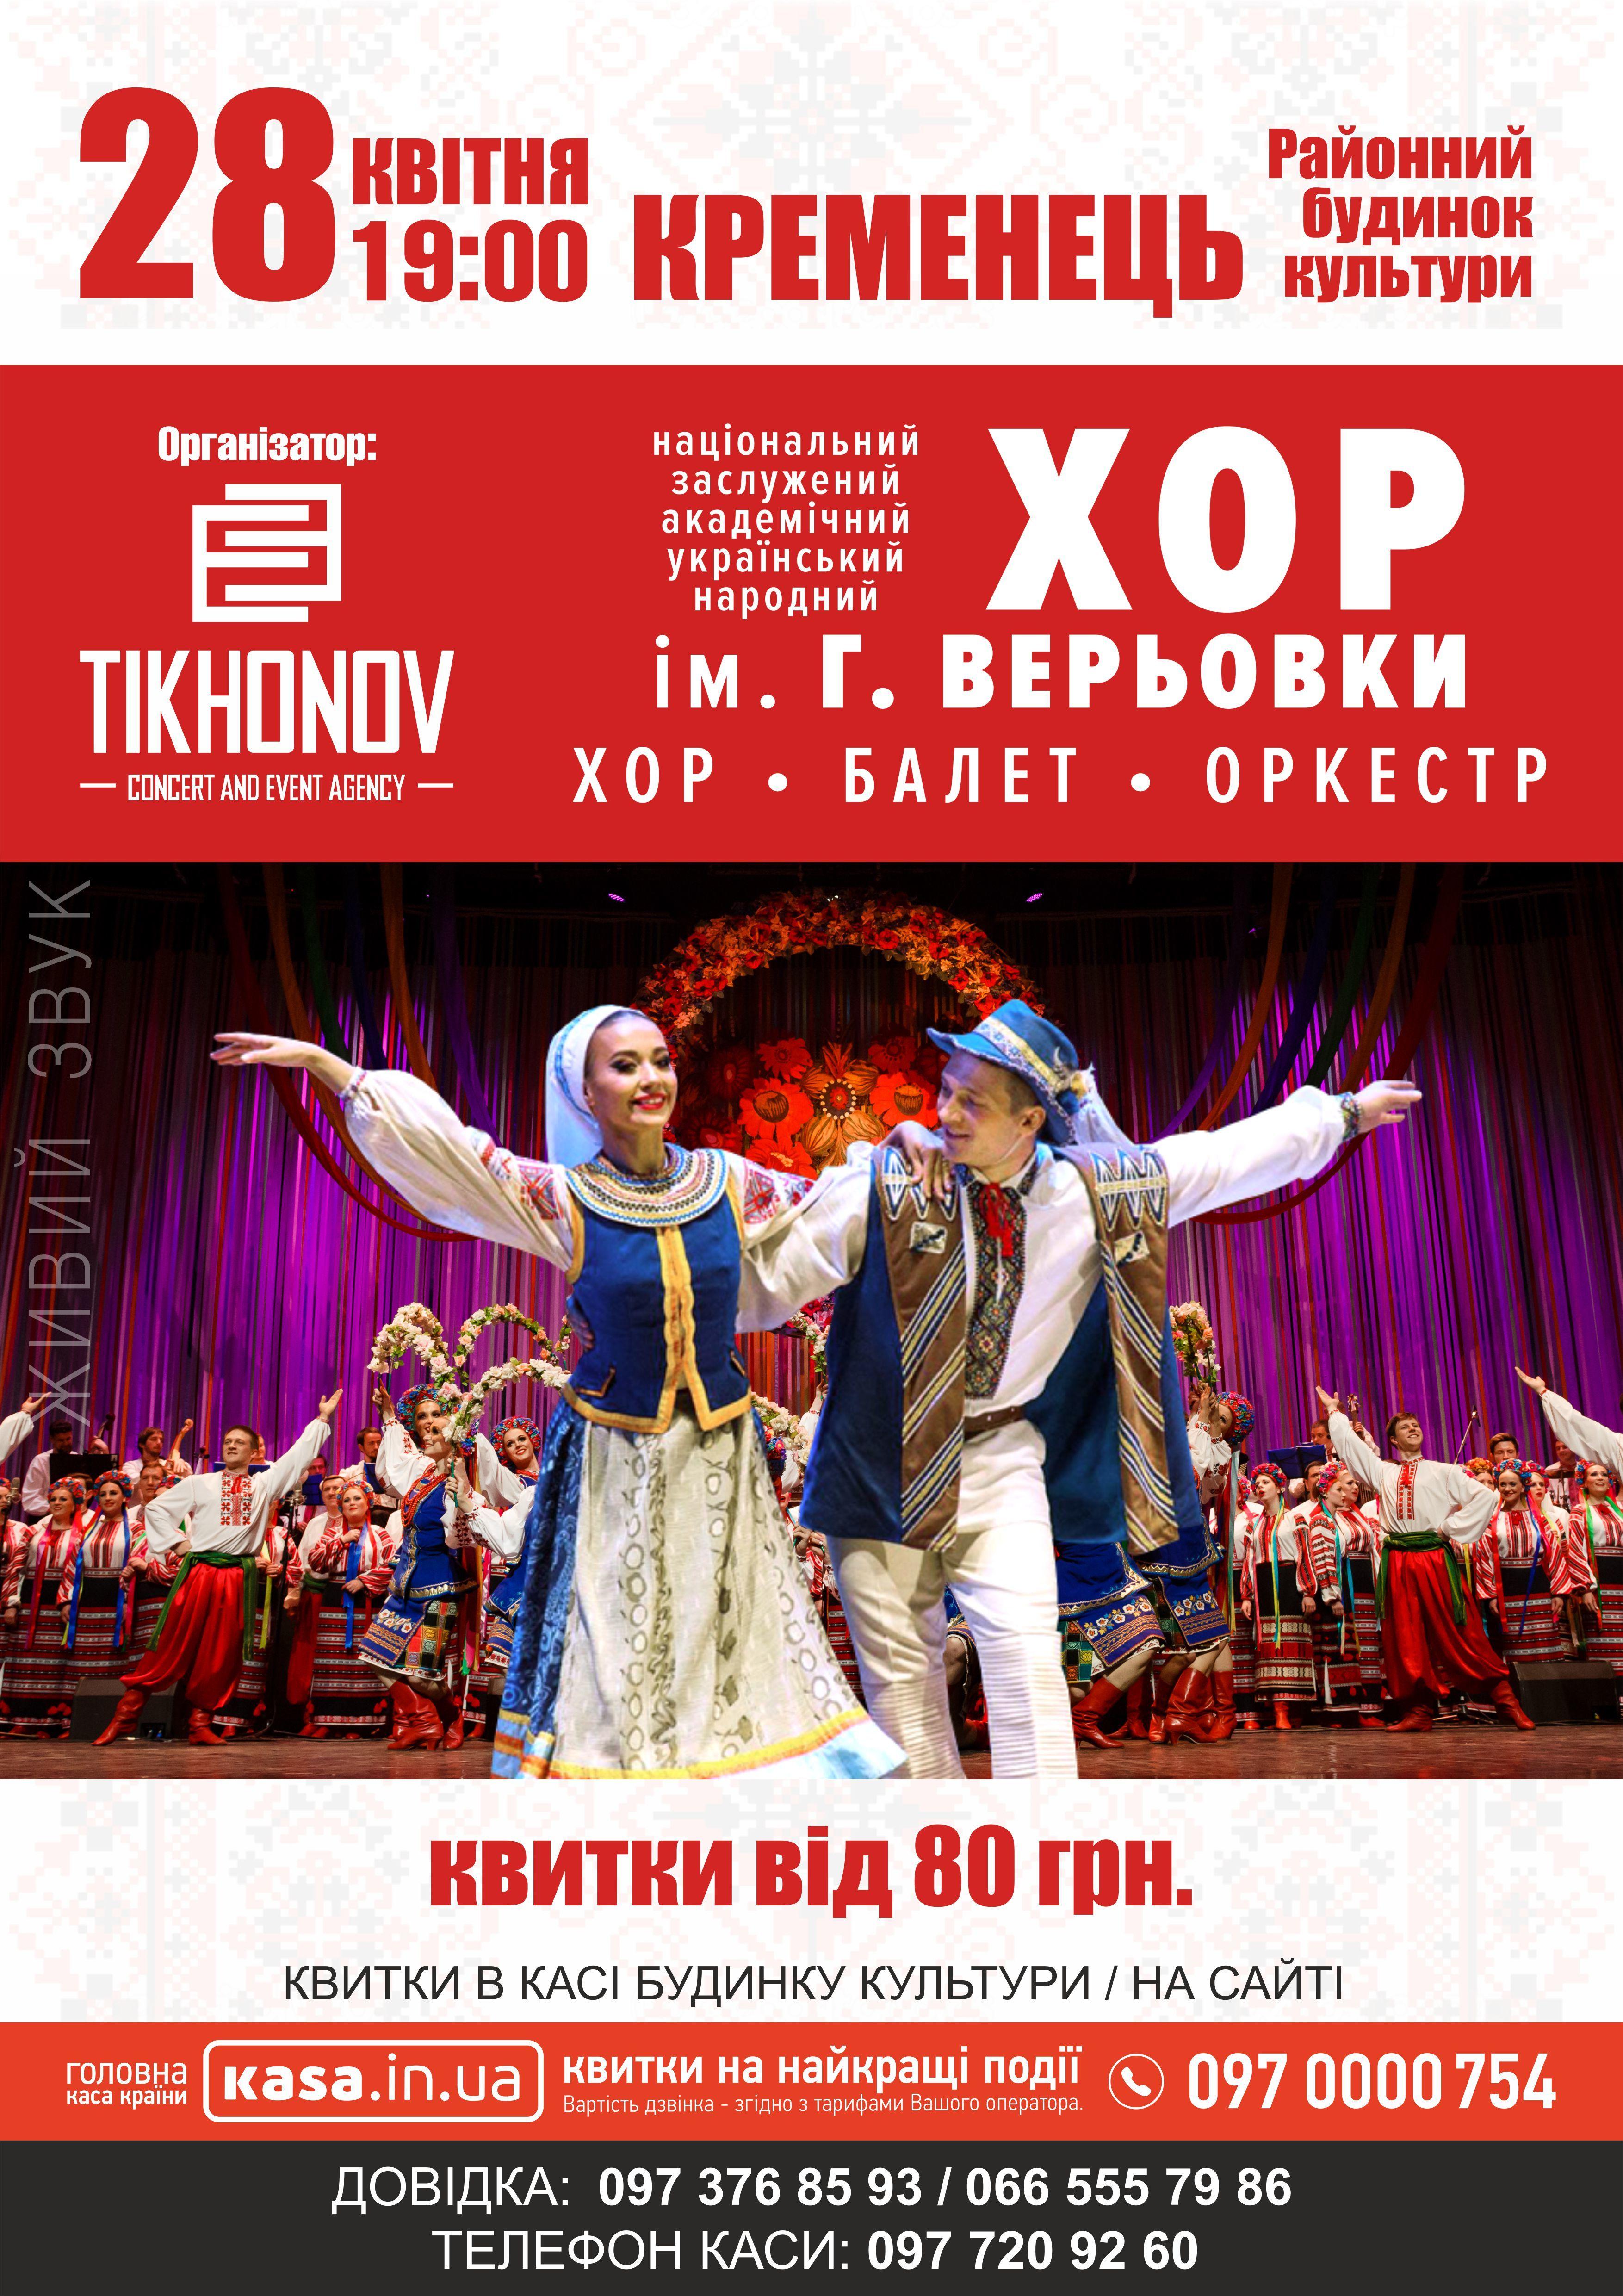 Хор ім. Г. Верьовки у Кременці